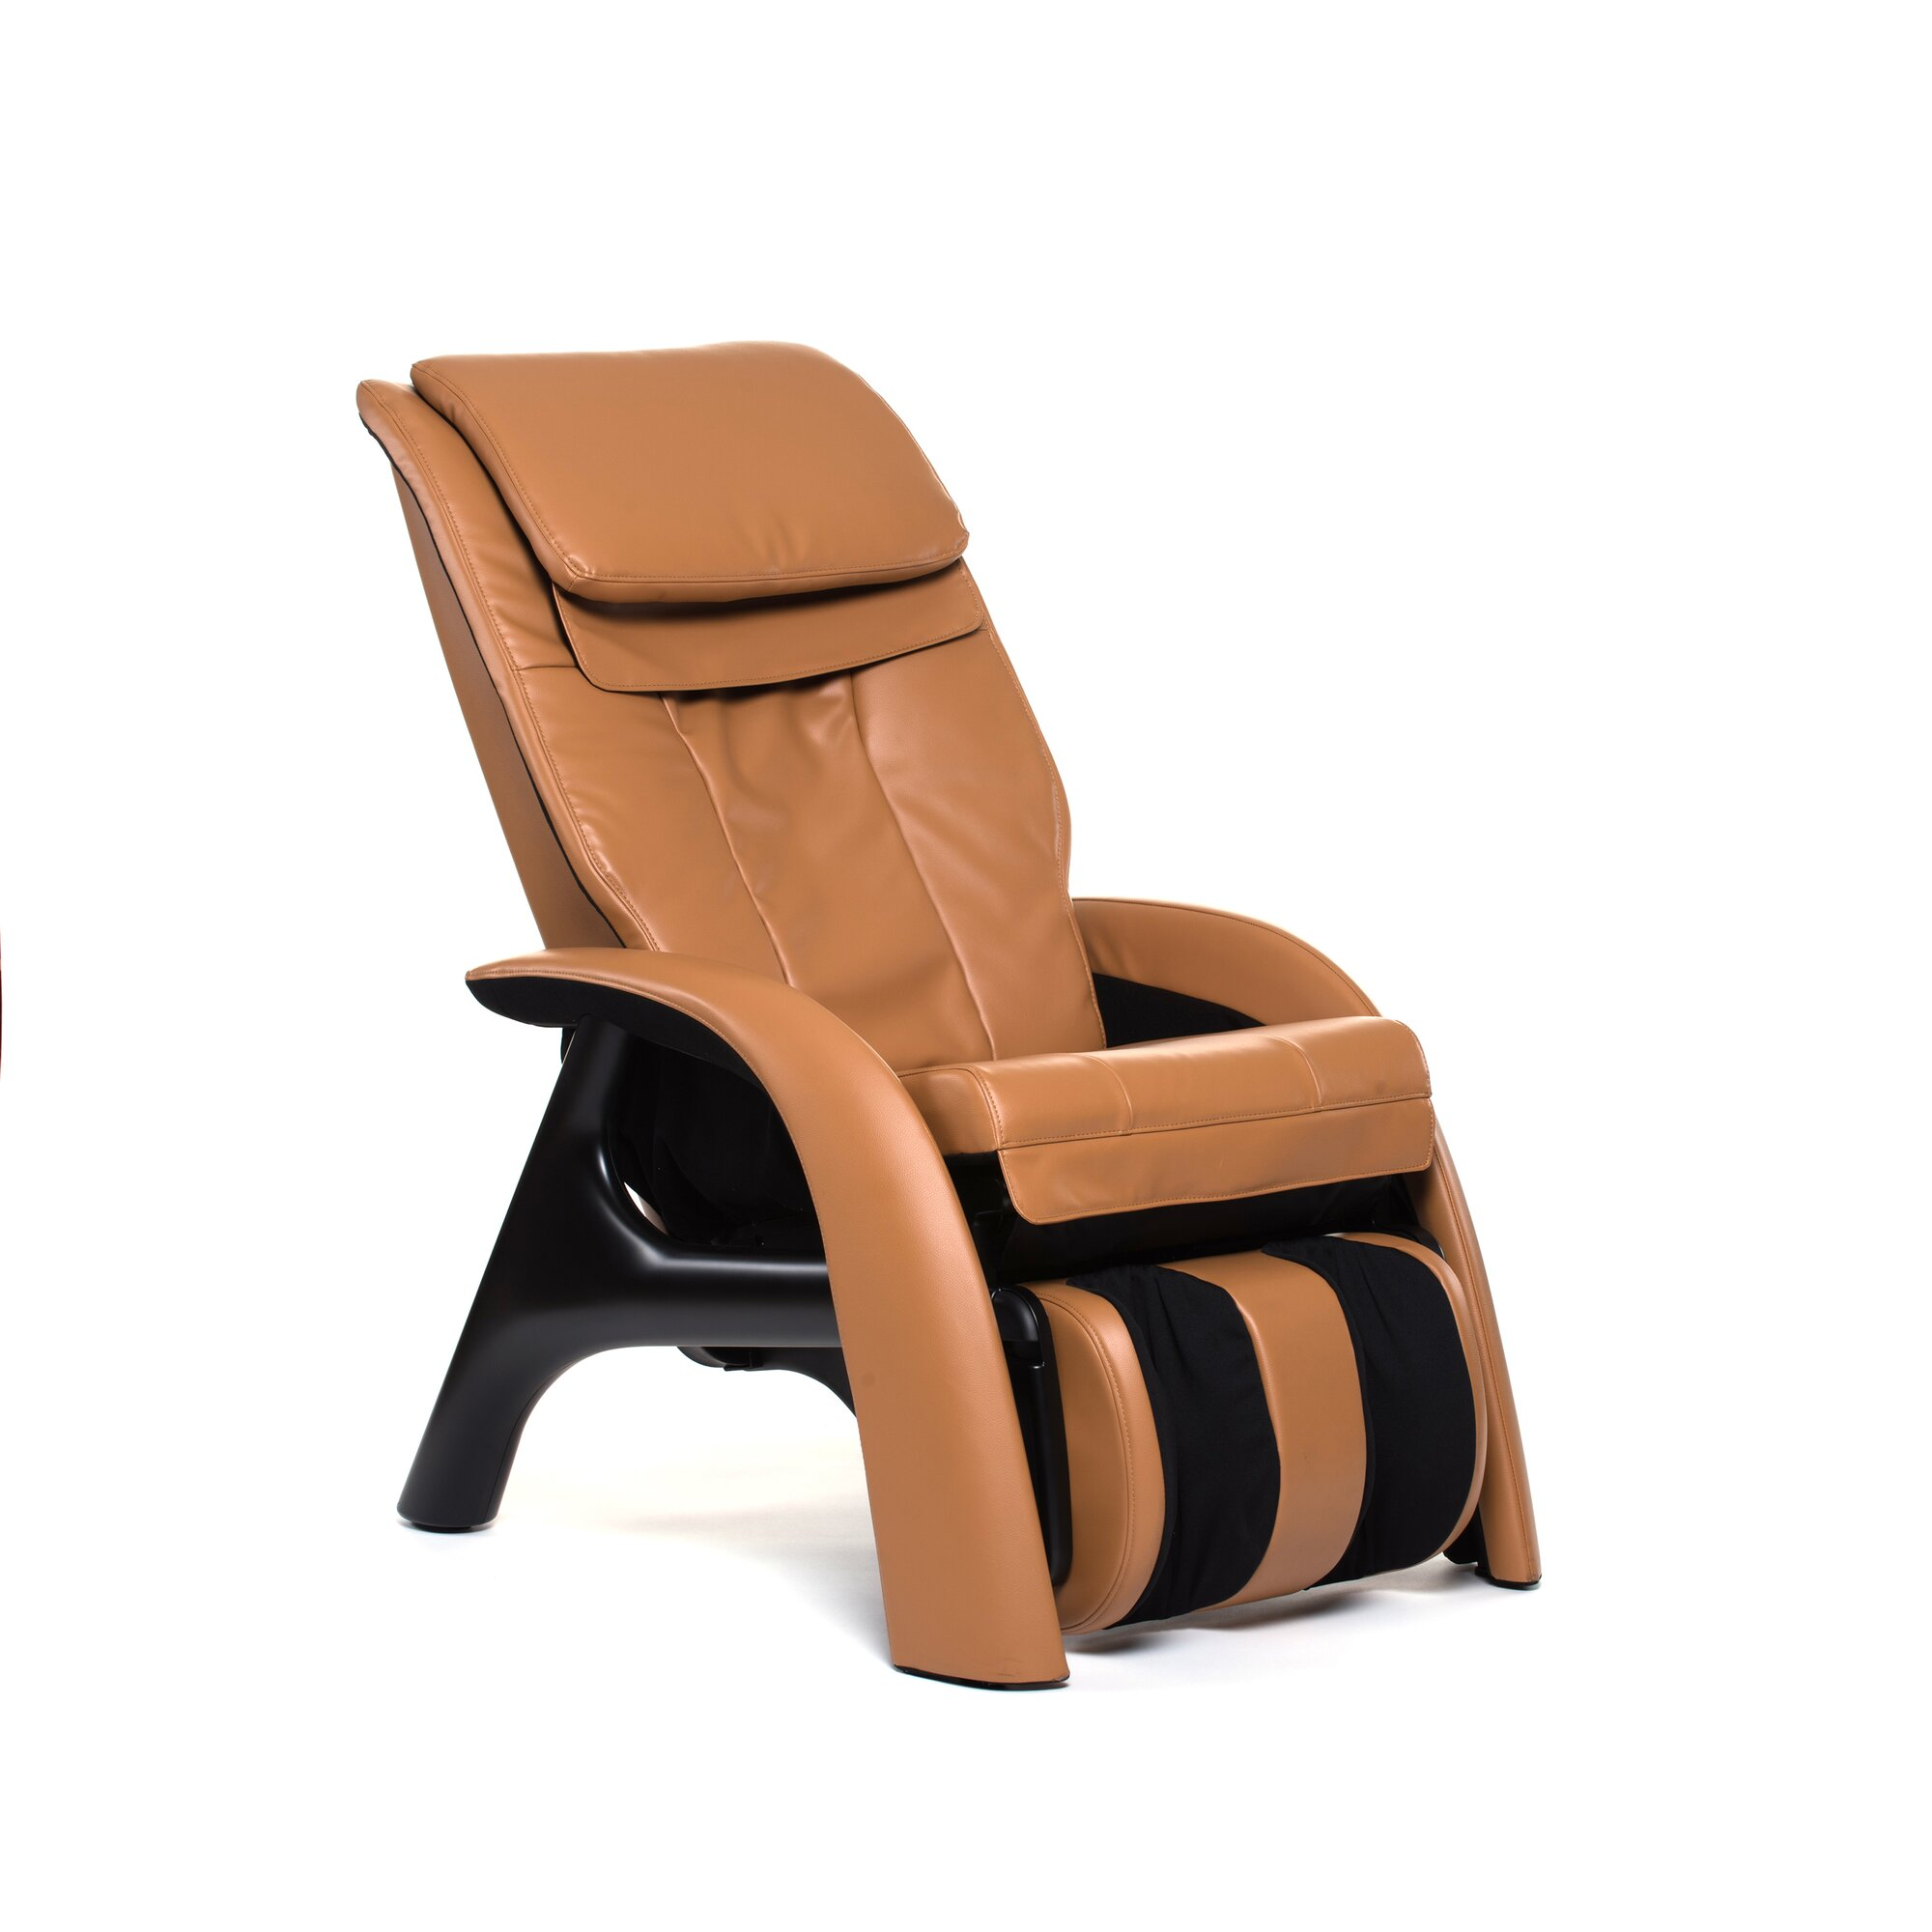 Massage Chair For Sale Philippines Massage Chair  : VolitoZeroGravityMassageChair from www.theridgewayinn.com size 2000 x 2000 jpeg 140kB